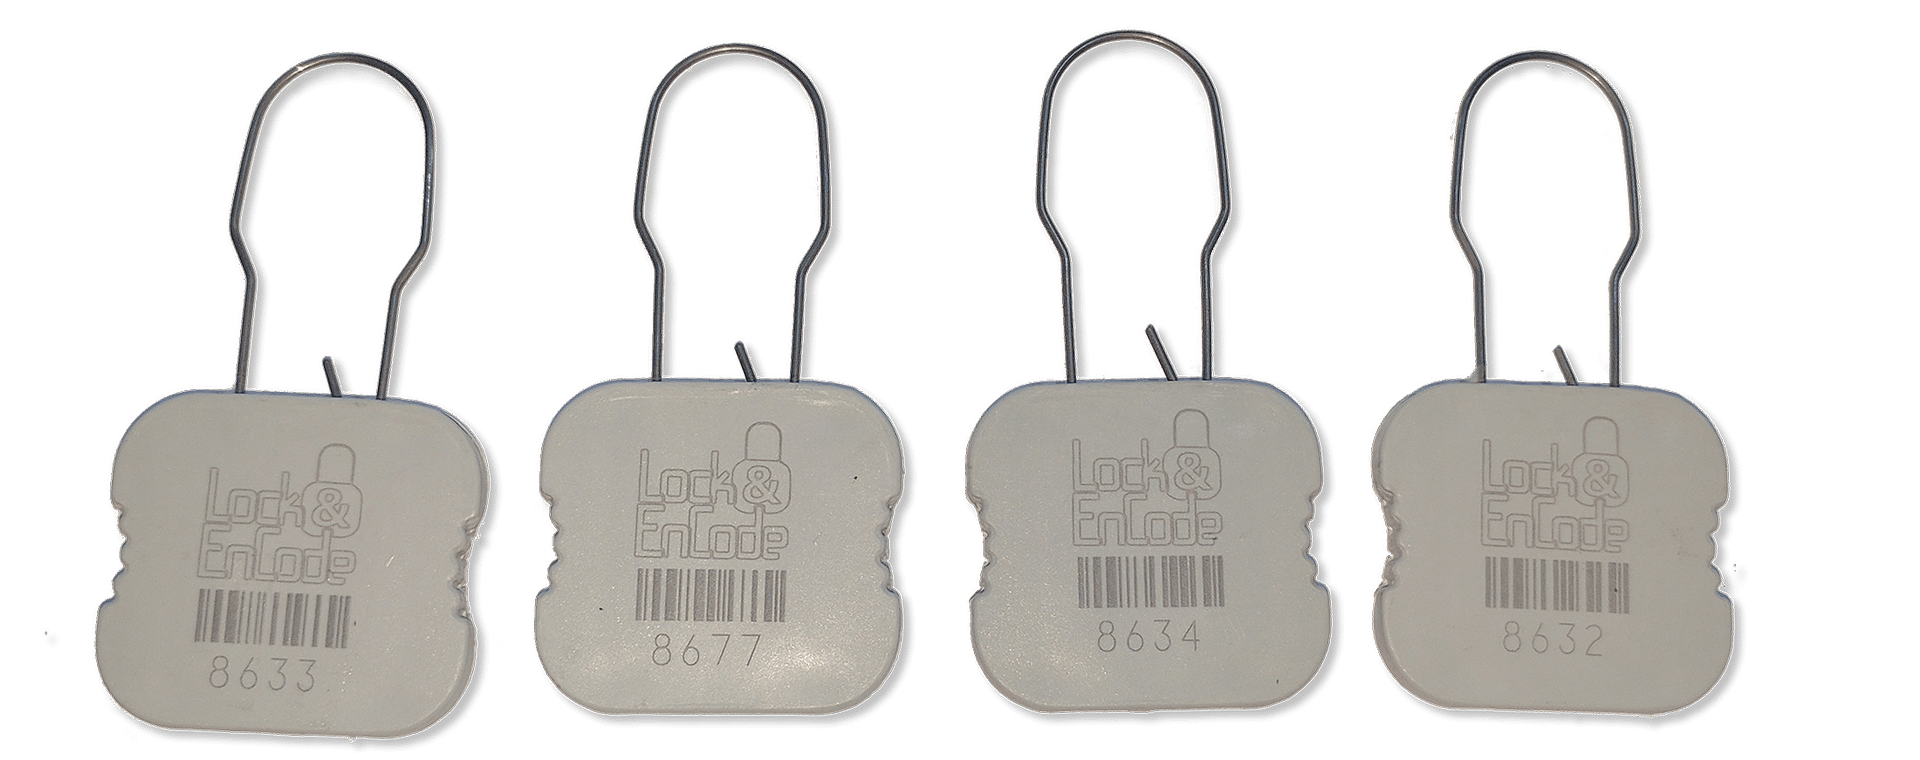 CYBRA's Lock & EnCode RFID seals secure shipments in transit.